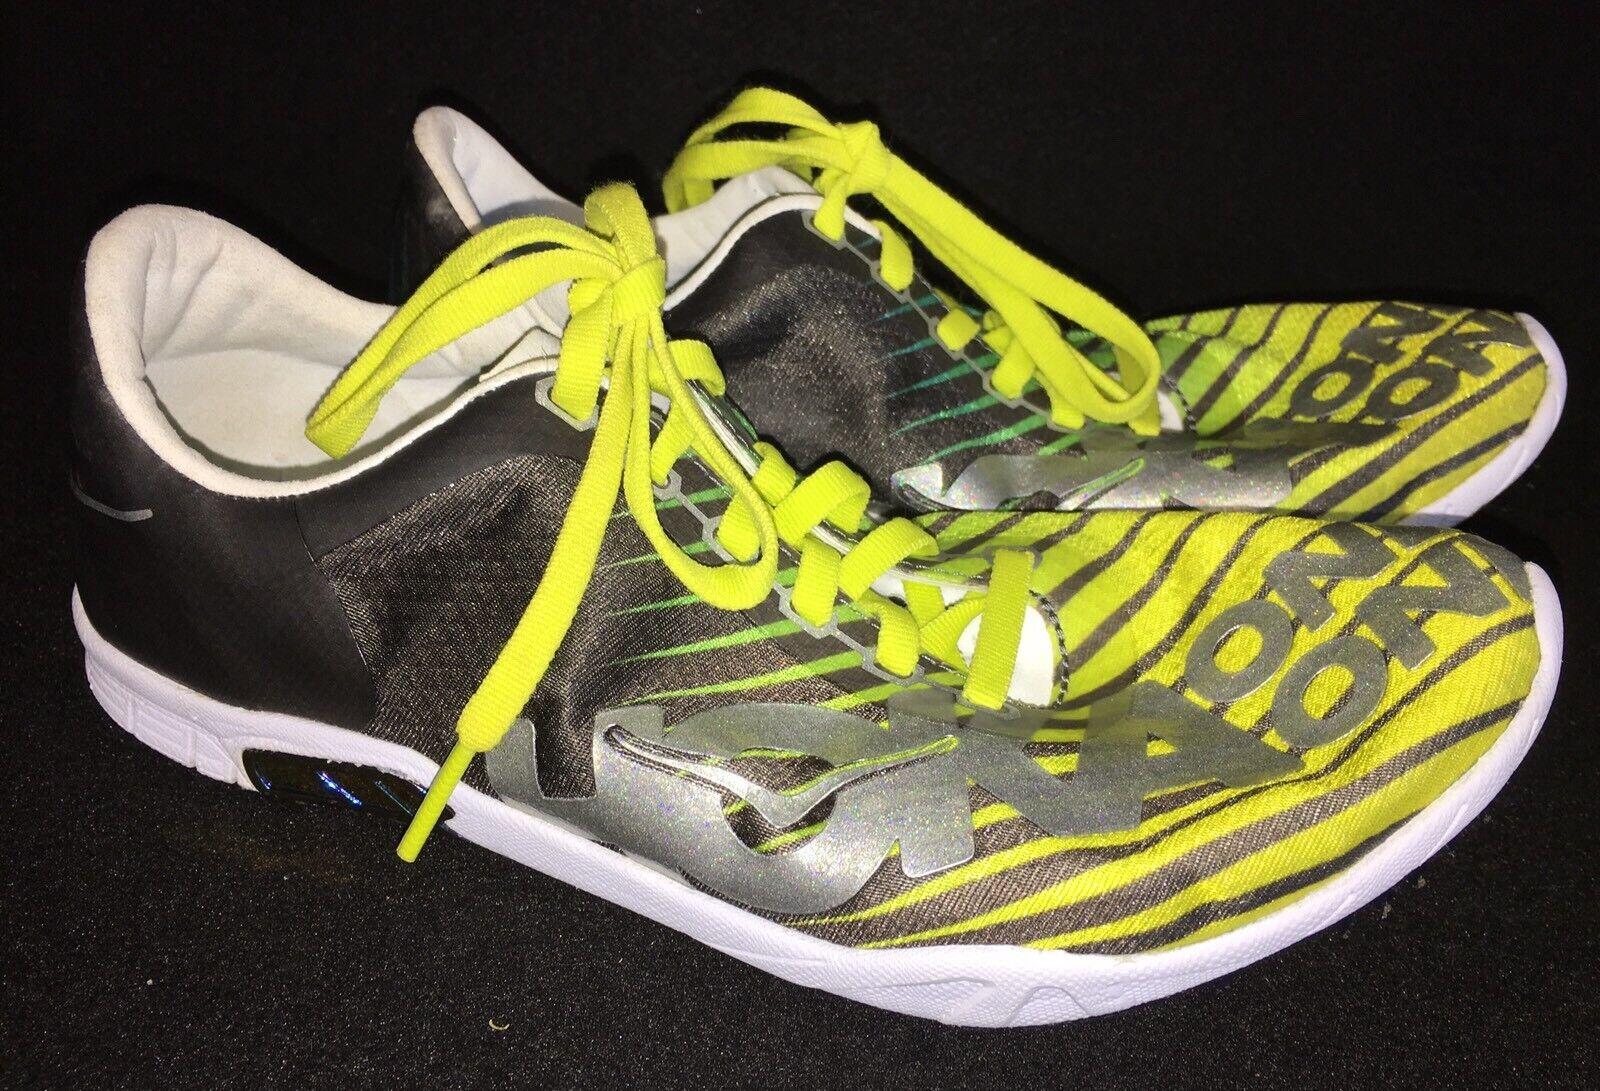 Hoka One One Speed Evo R Rio Schuhes Running Track Yellow Green Silver Grau